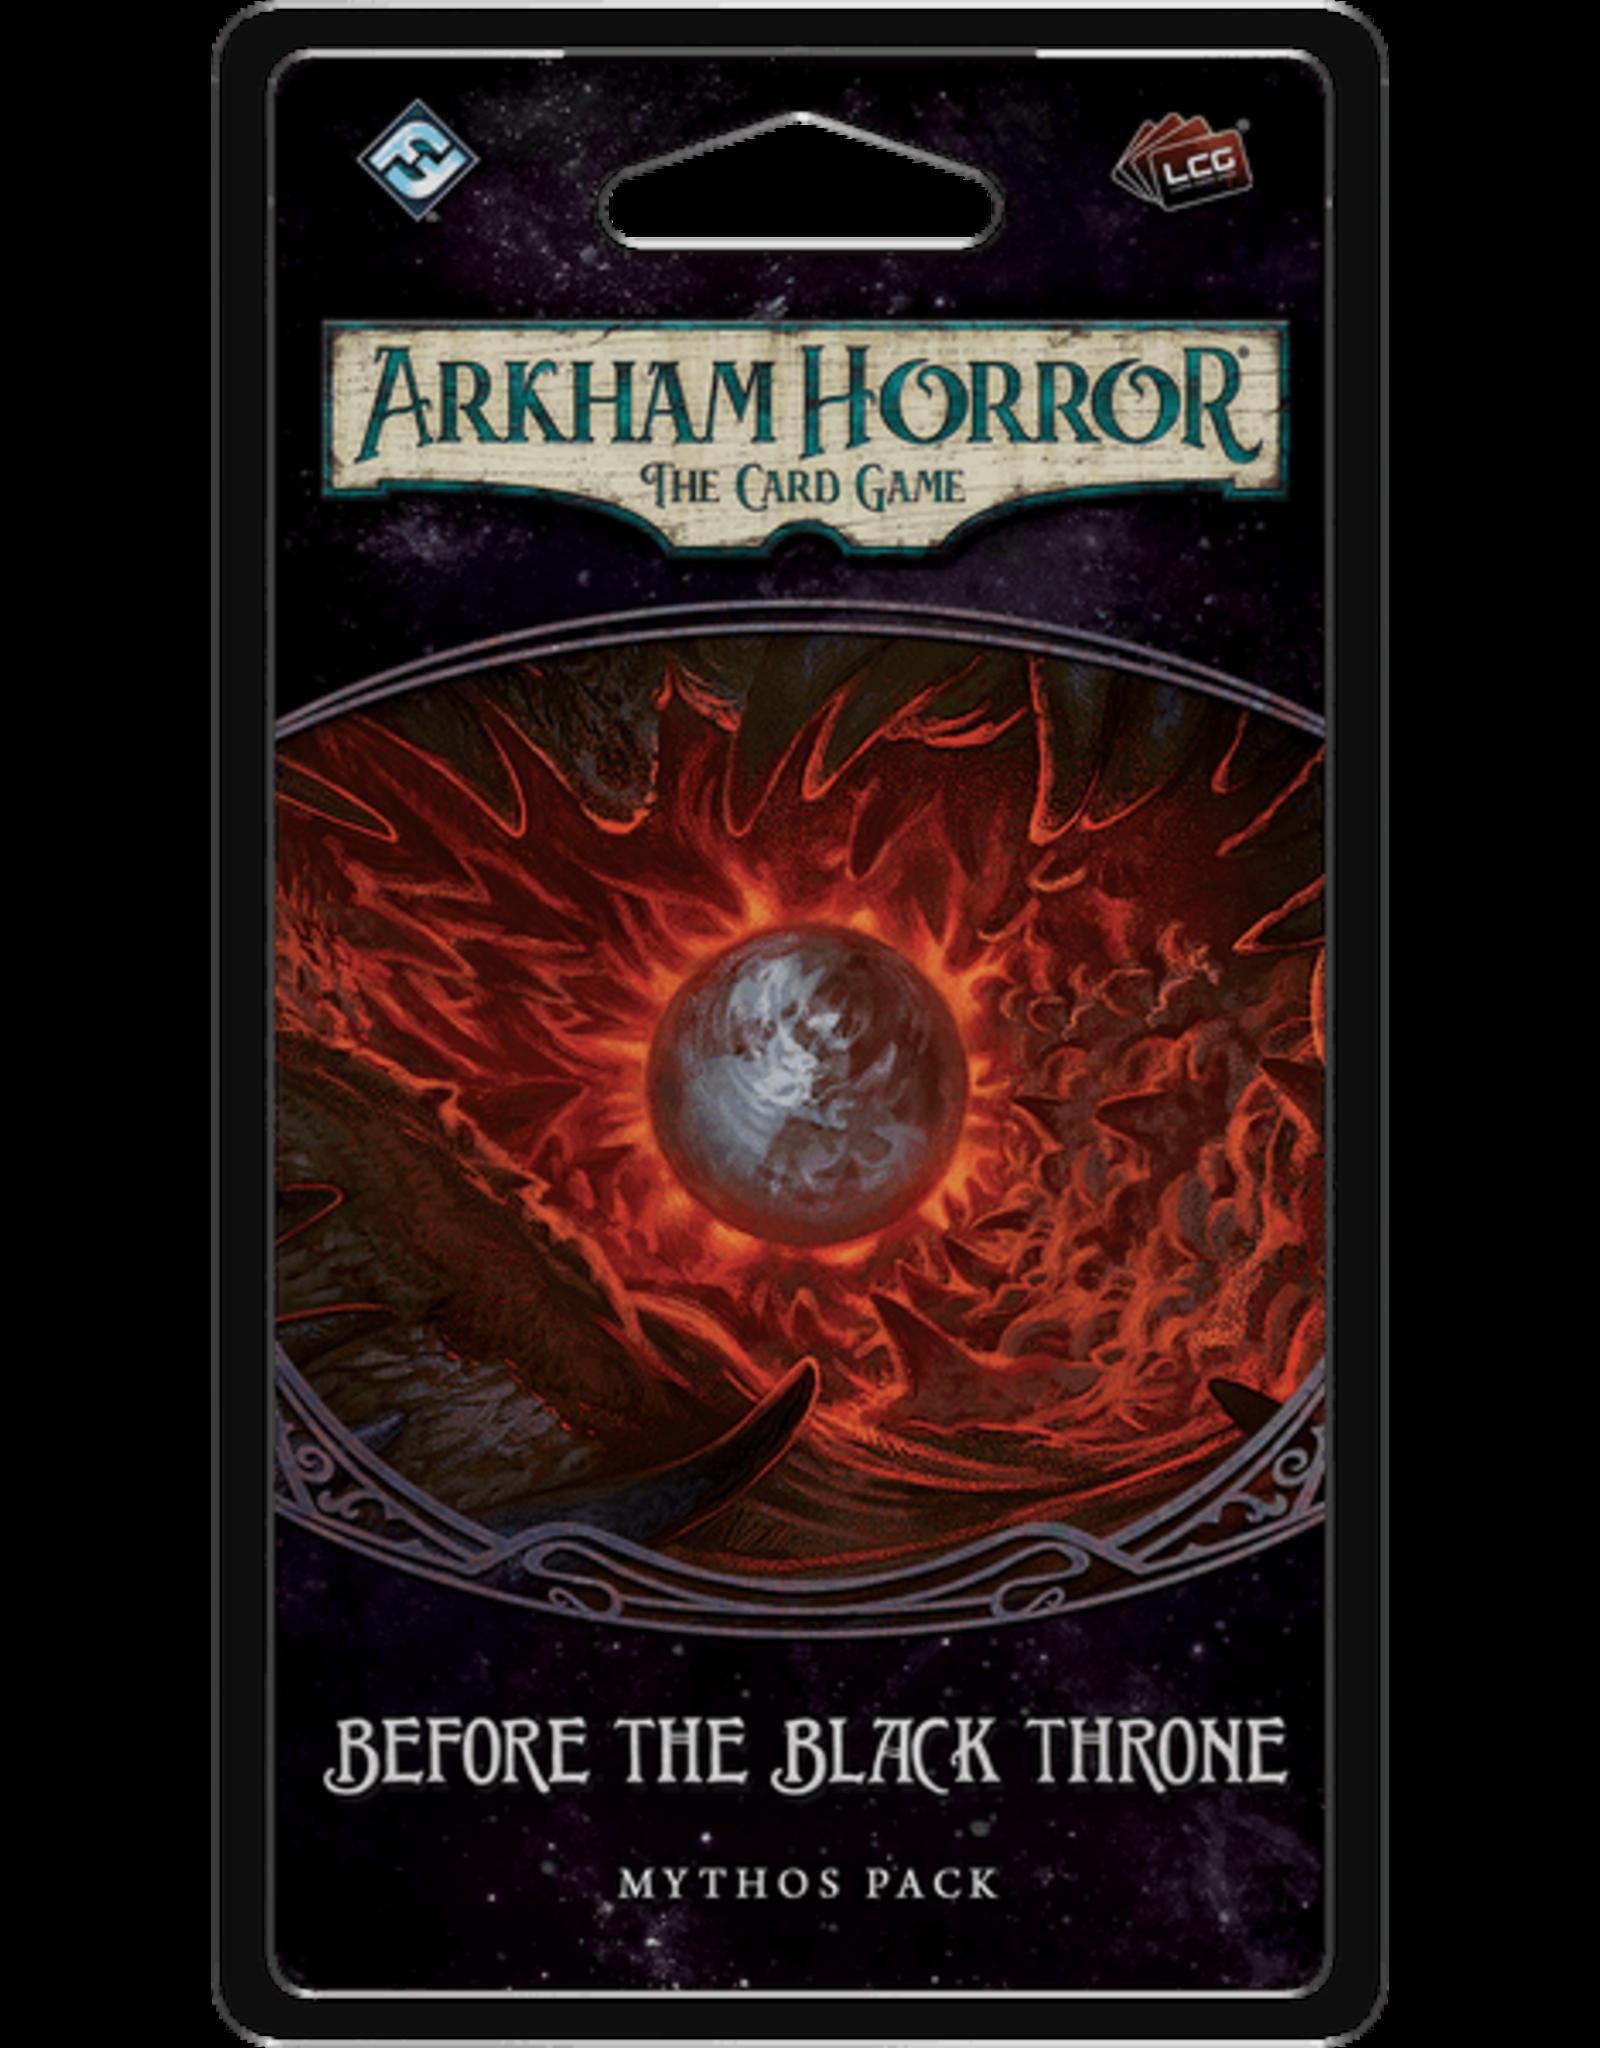 Fantasy Flight Games Arkham Horror LCG: The Circle Undone Cycle Mythos Packs